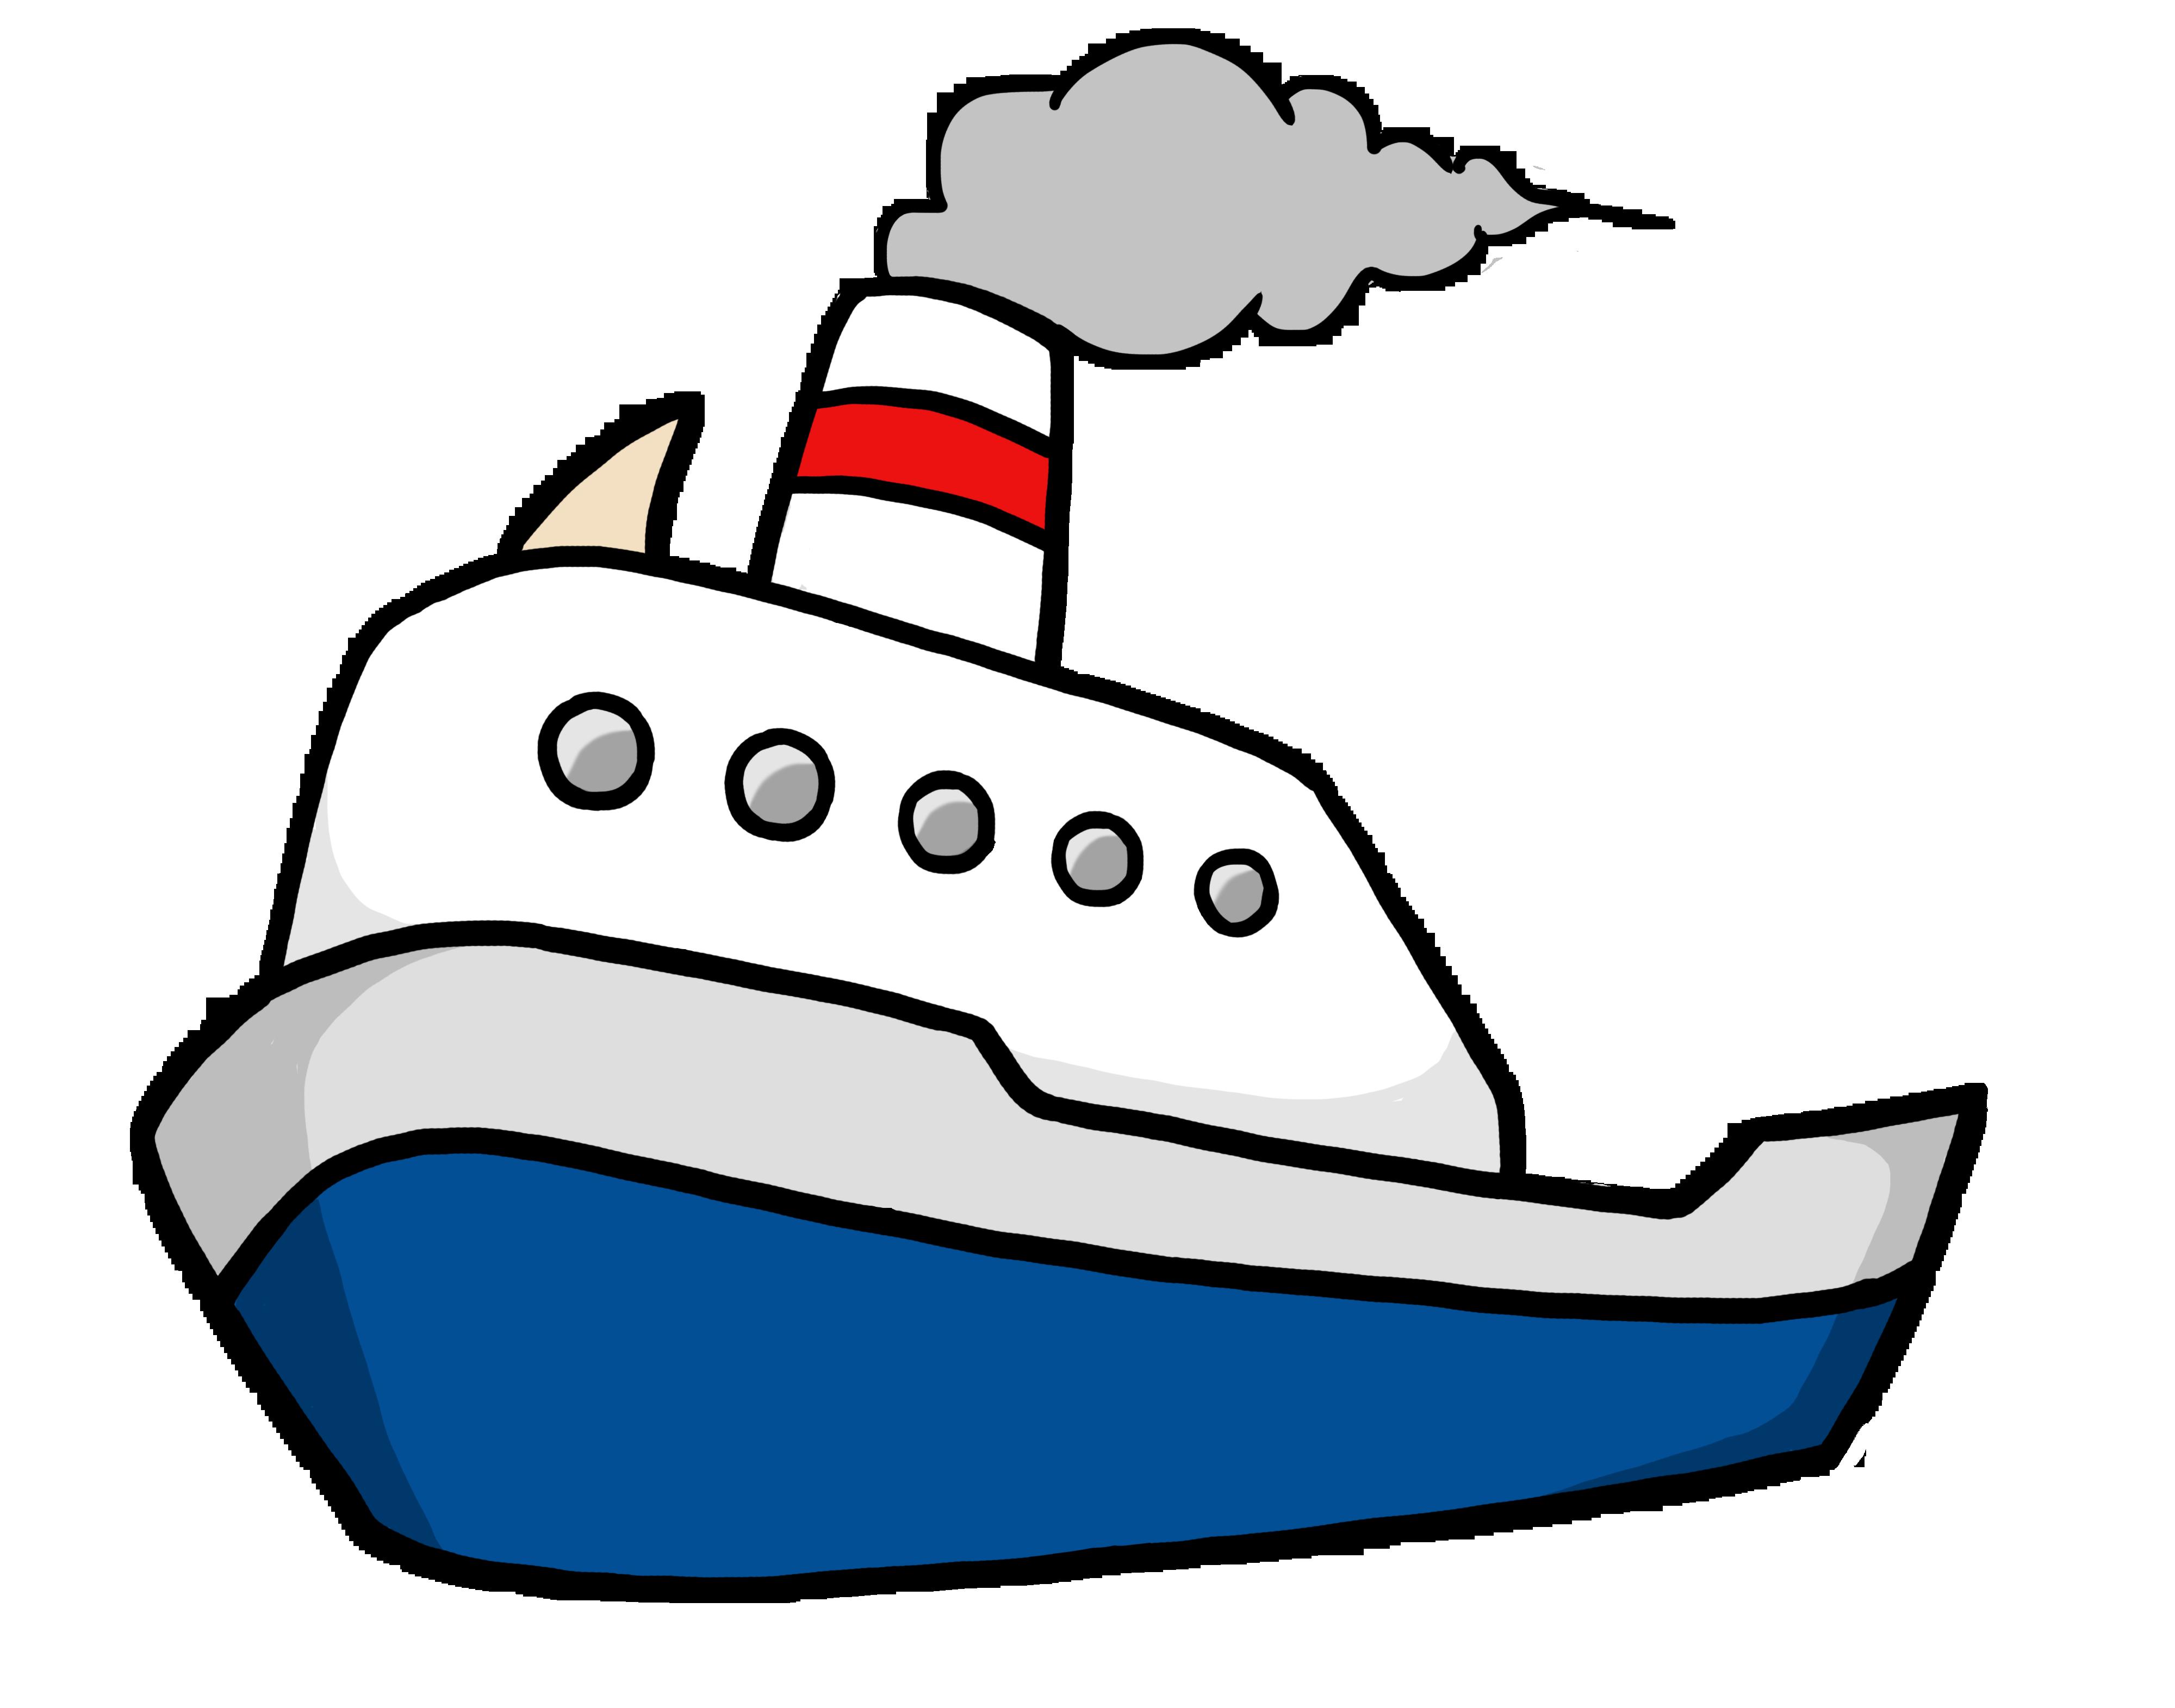 4000x3142 Ship Clip Art Free Clipart Images